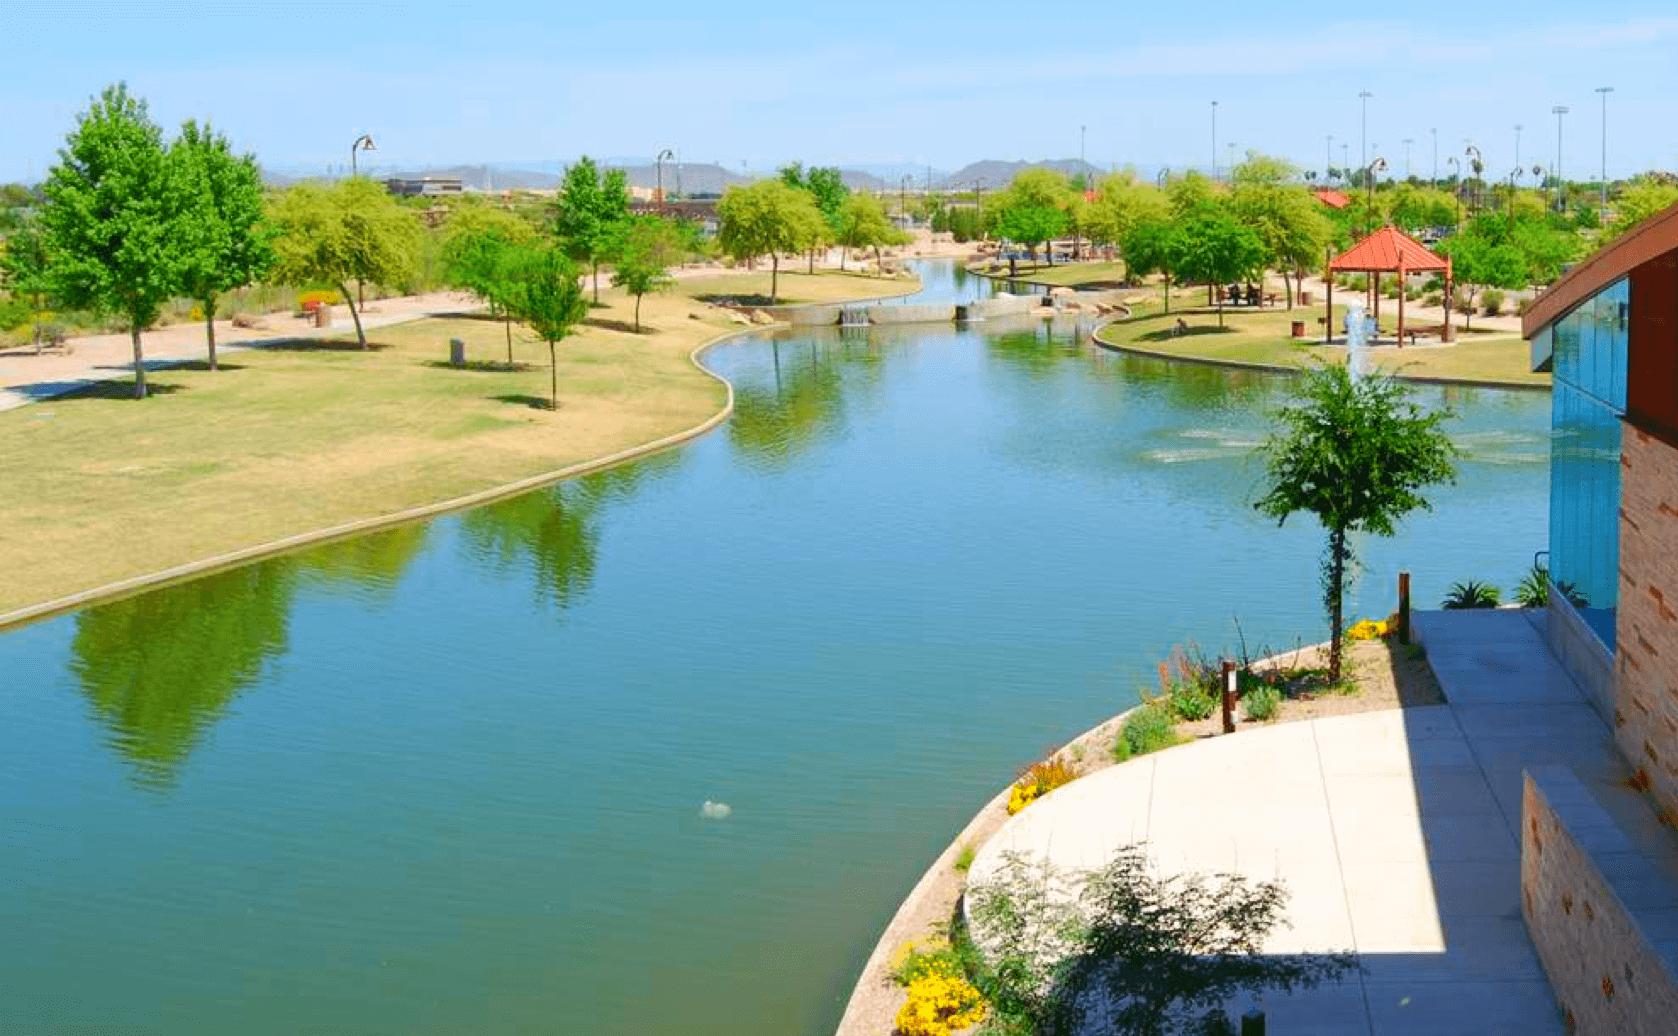 Rio-Vista-Community-Lake-Fishing-Guide-Peoria-AZ-02